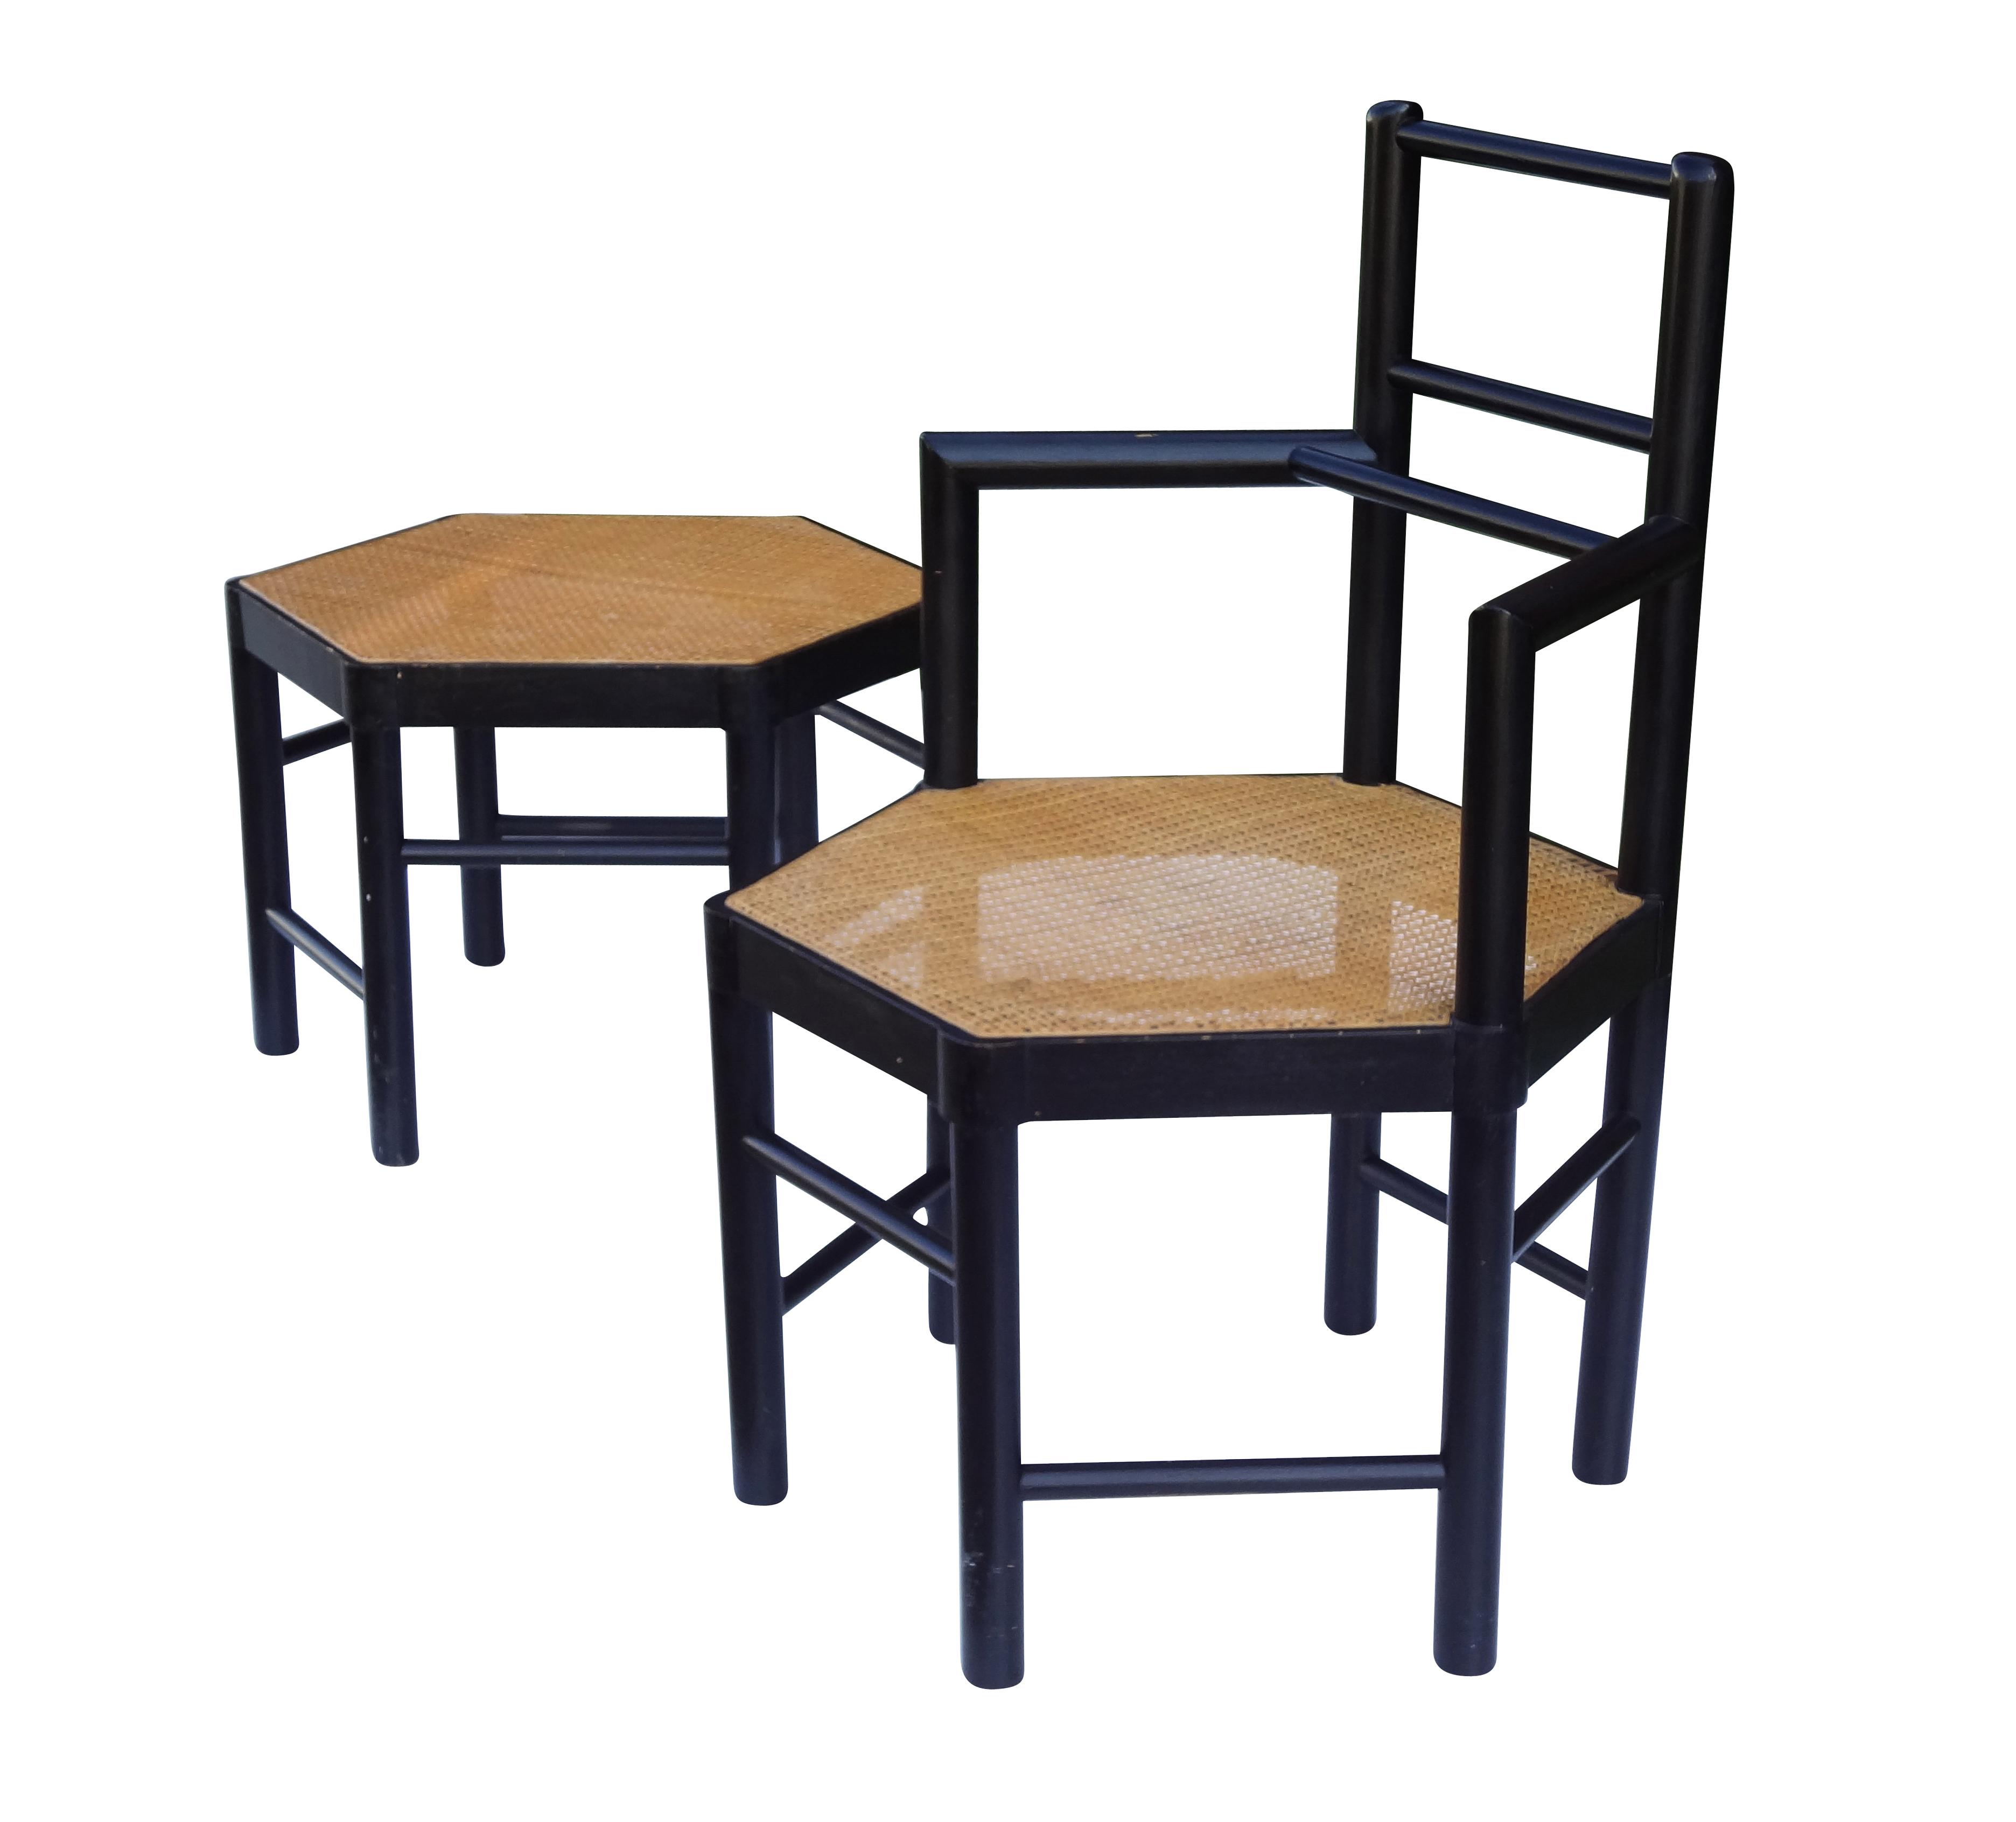 Josef Hoffmann Style Hexagonal Chair Amp Ottoman Set Chairish